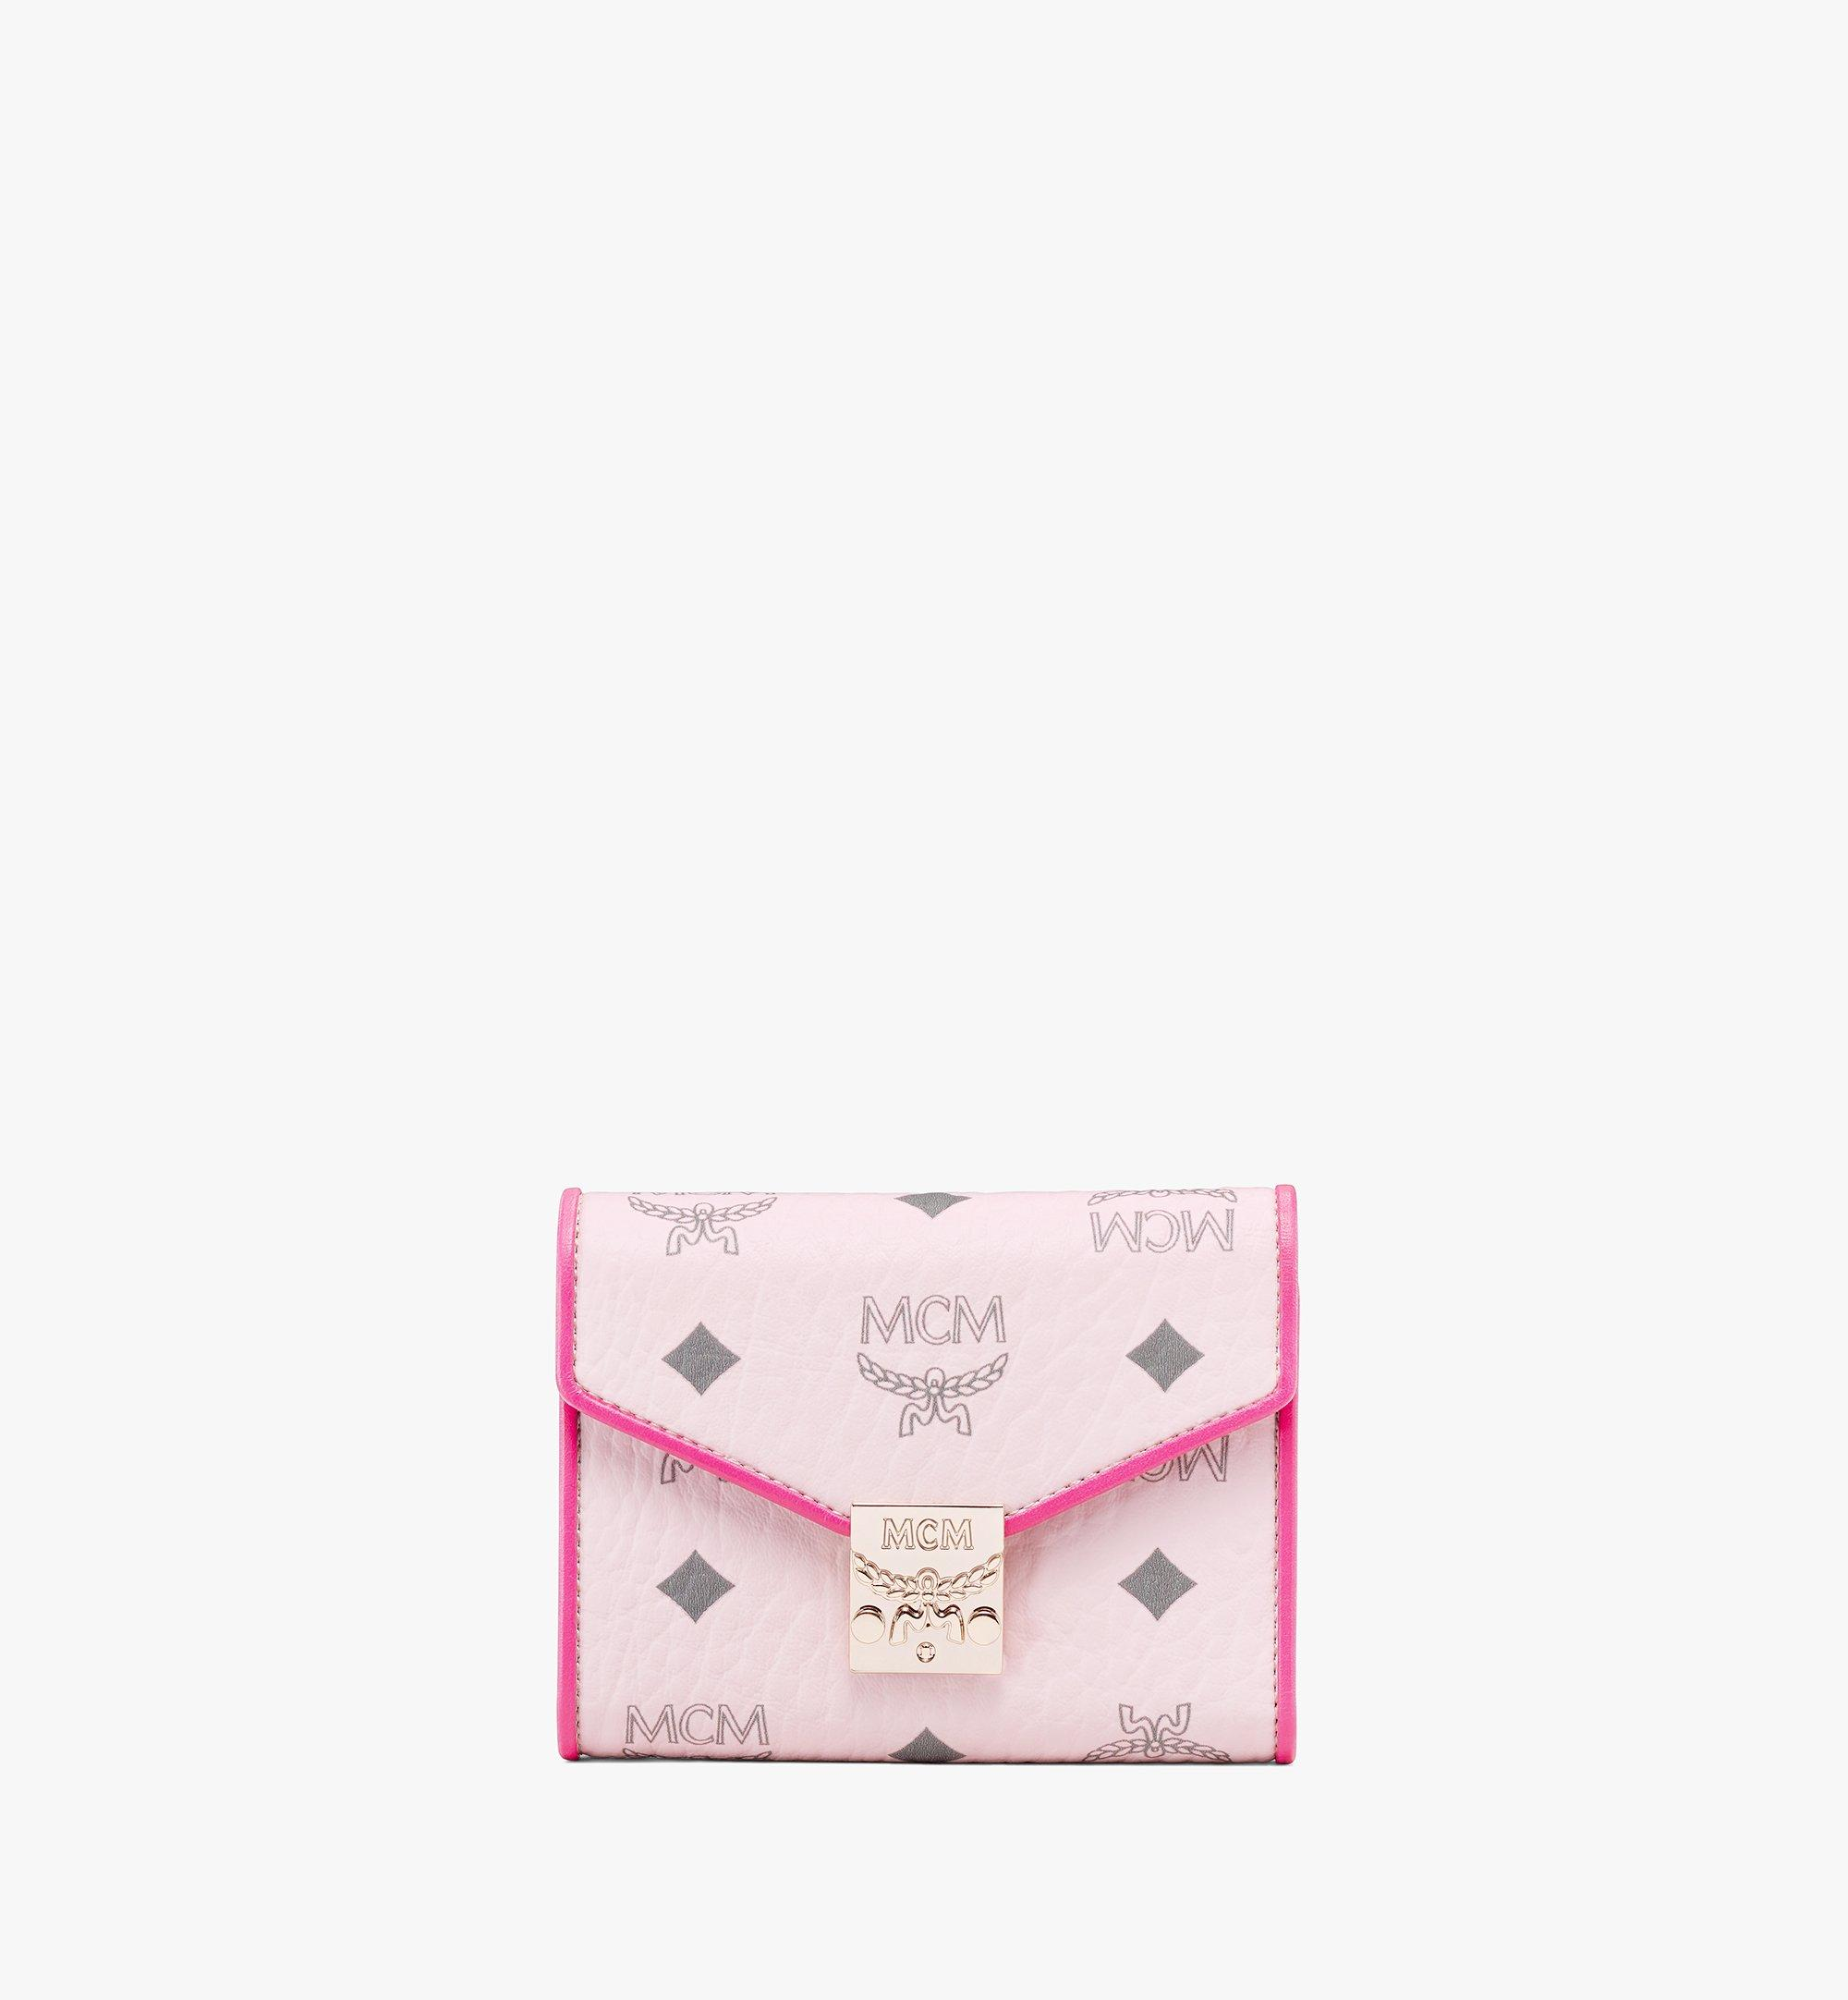 MCM 〈パトリシア〉三つ折りウォレット - ヴィセトス レザー ブロック Pink MYSAAPA05QH001 Alternate View 1